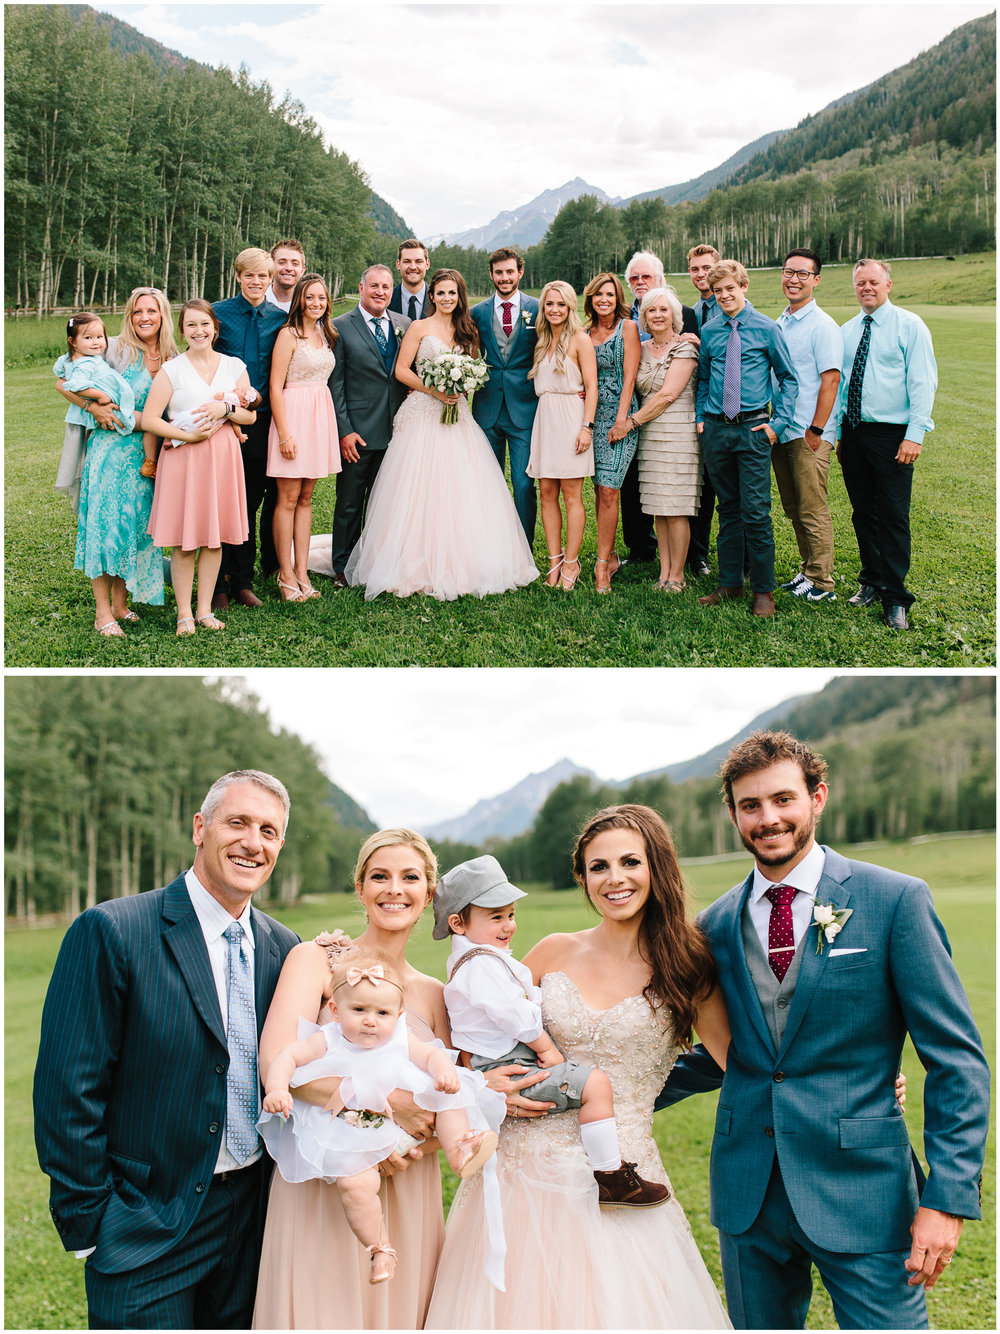 aspen_wedding_41a.jpg